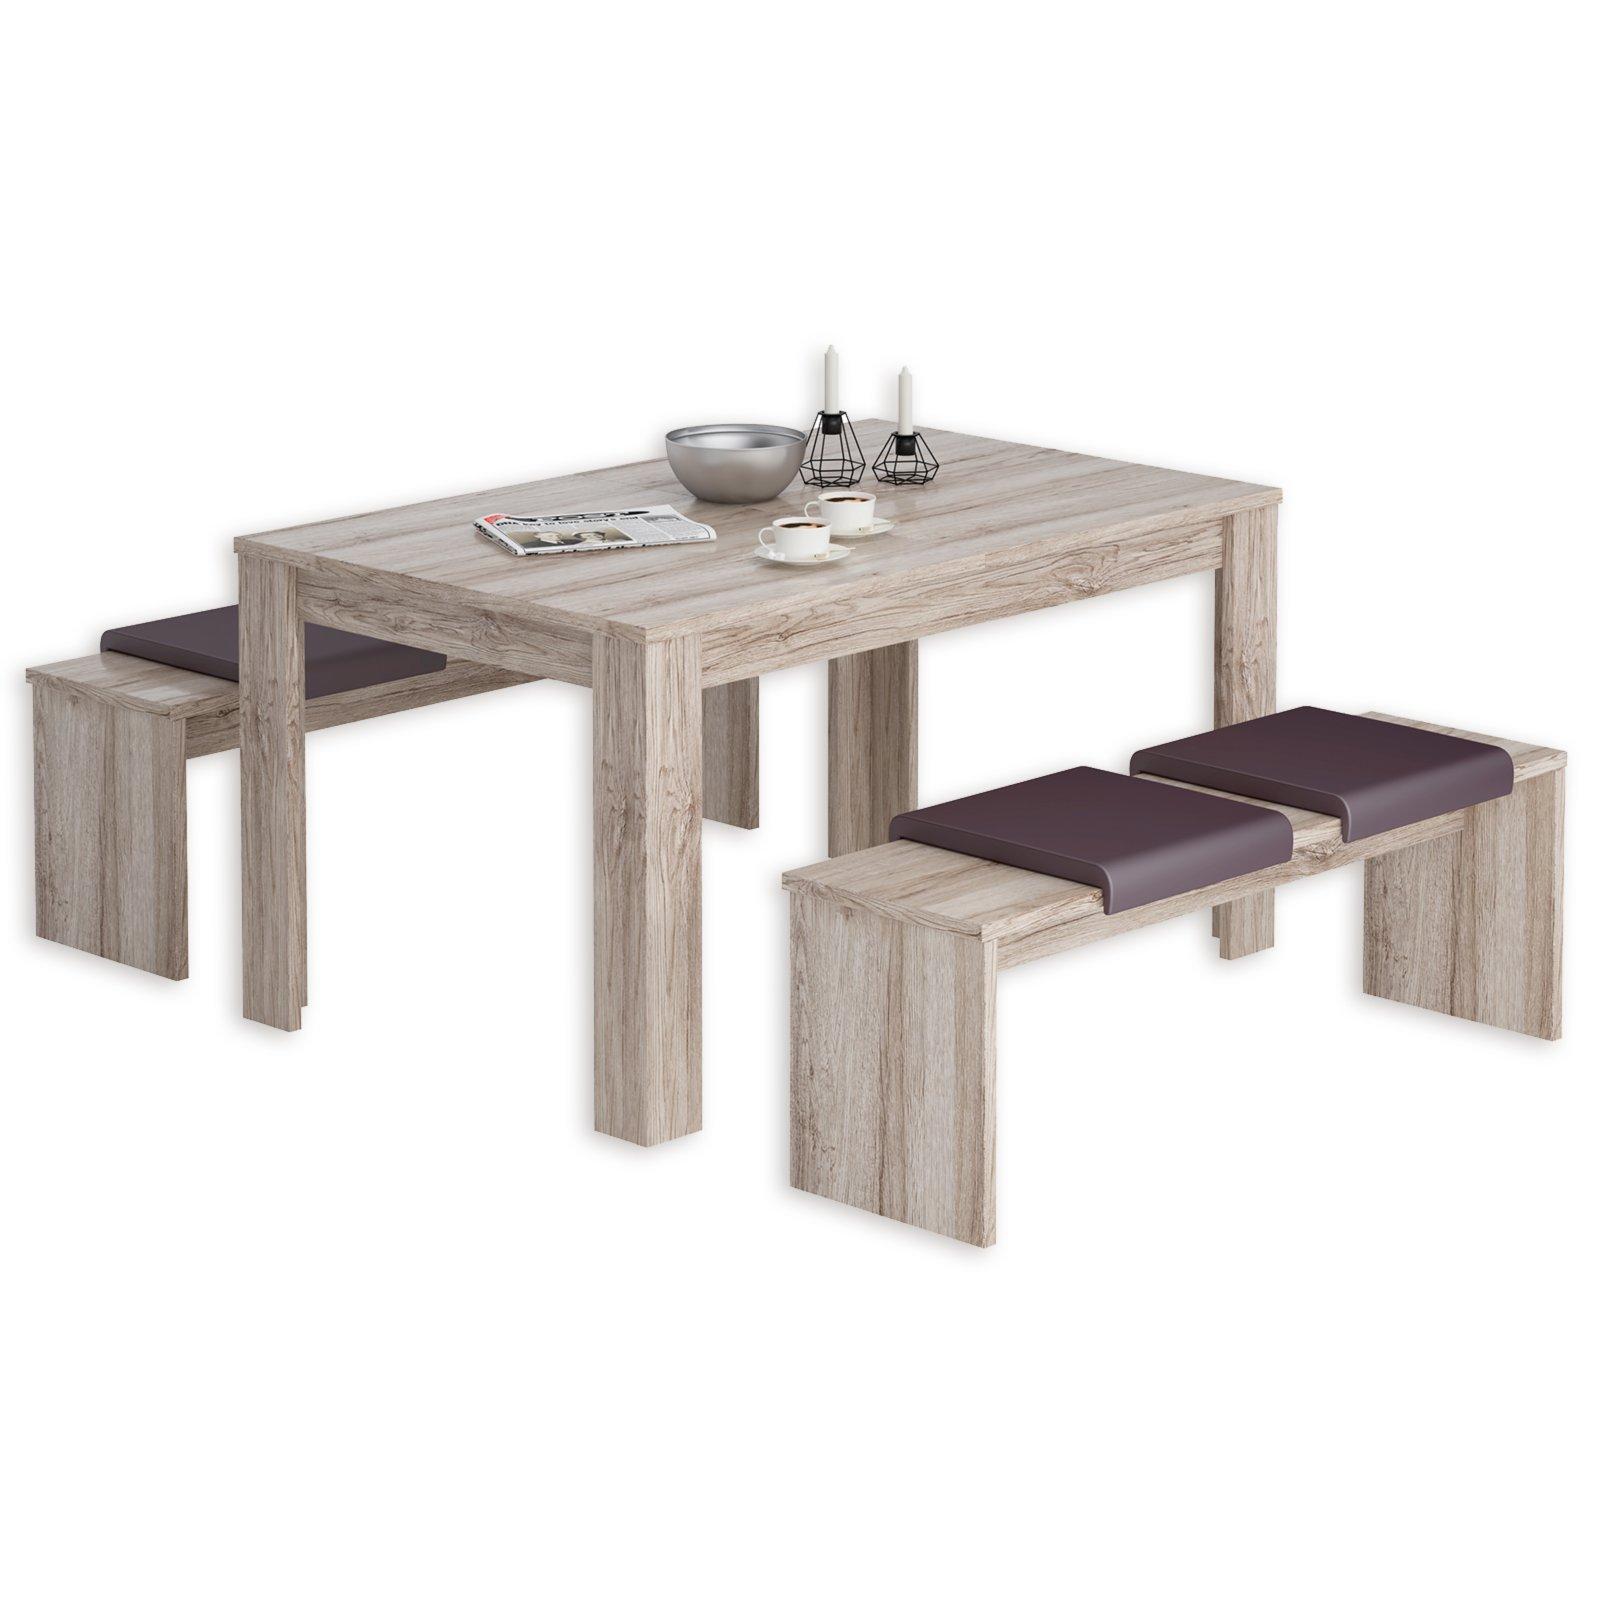 3 teilige tischgruppe dijon sandeiche essgruppen. Black Bedroom Furniture Sets. Home Design Ideas